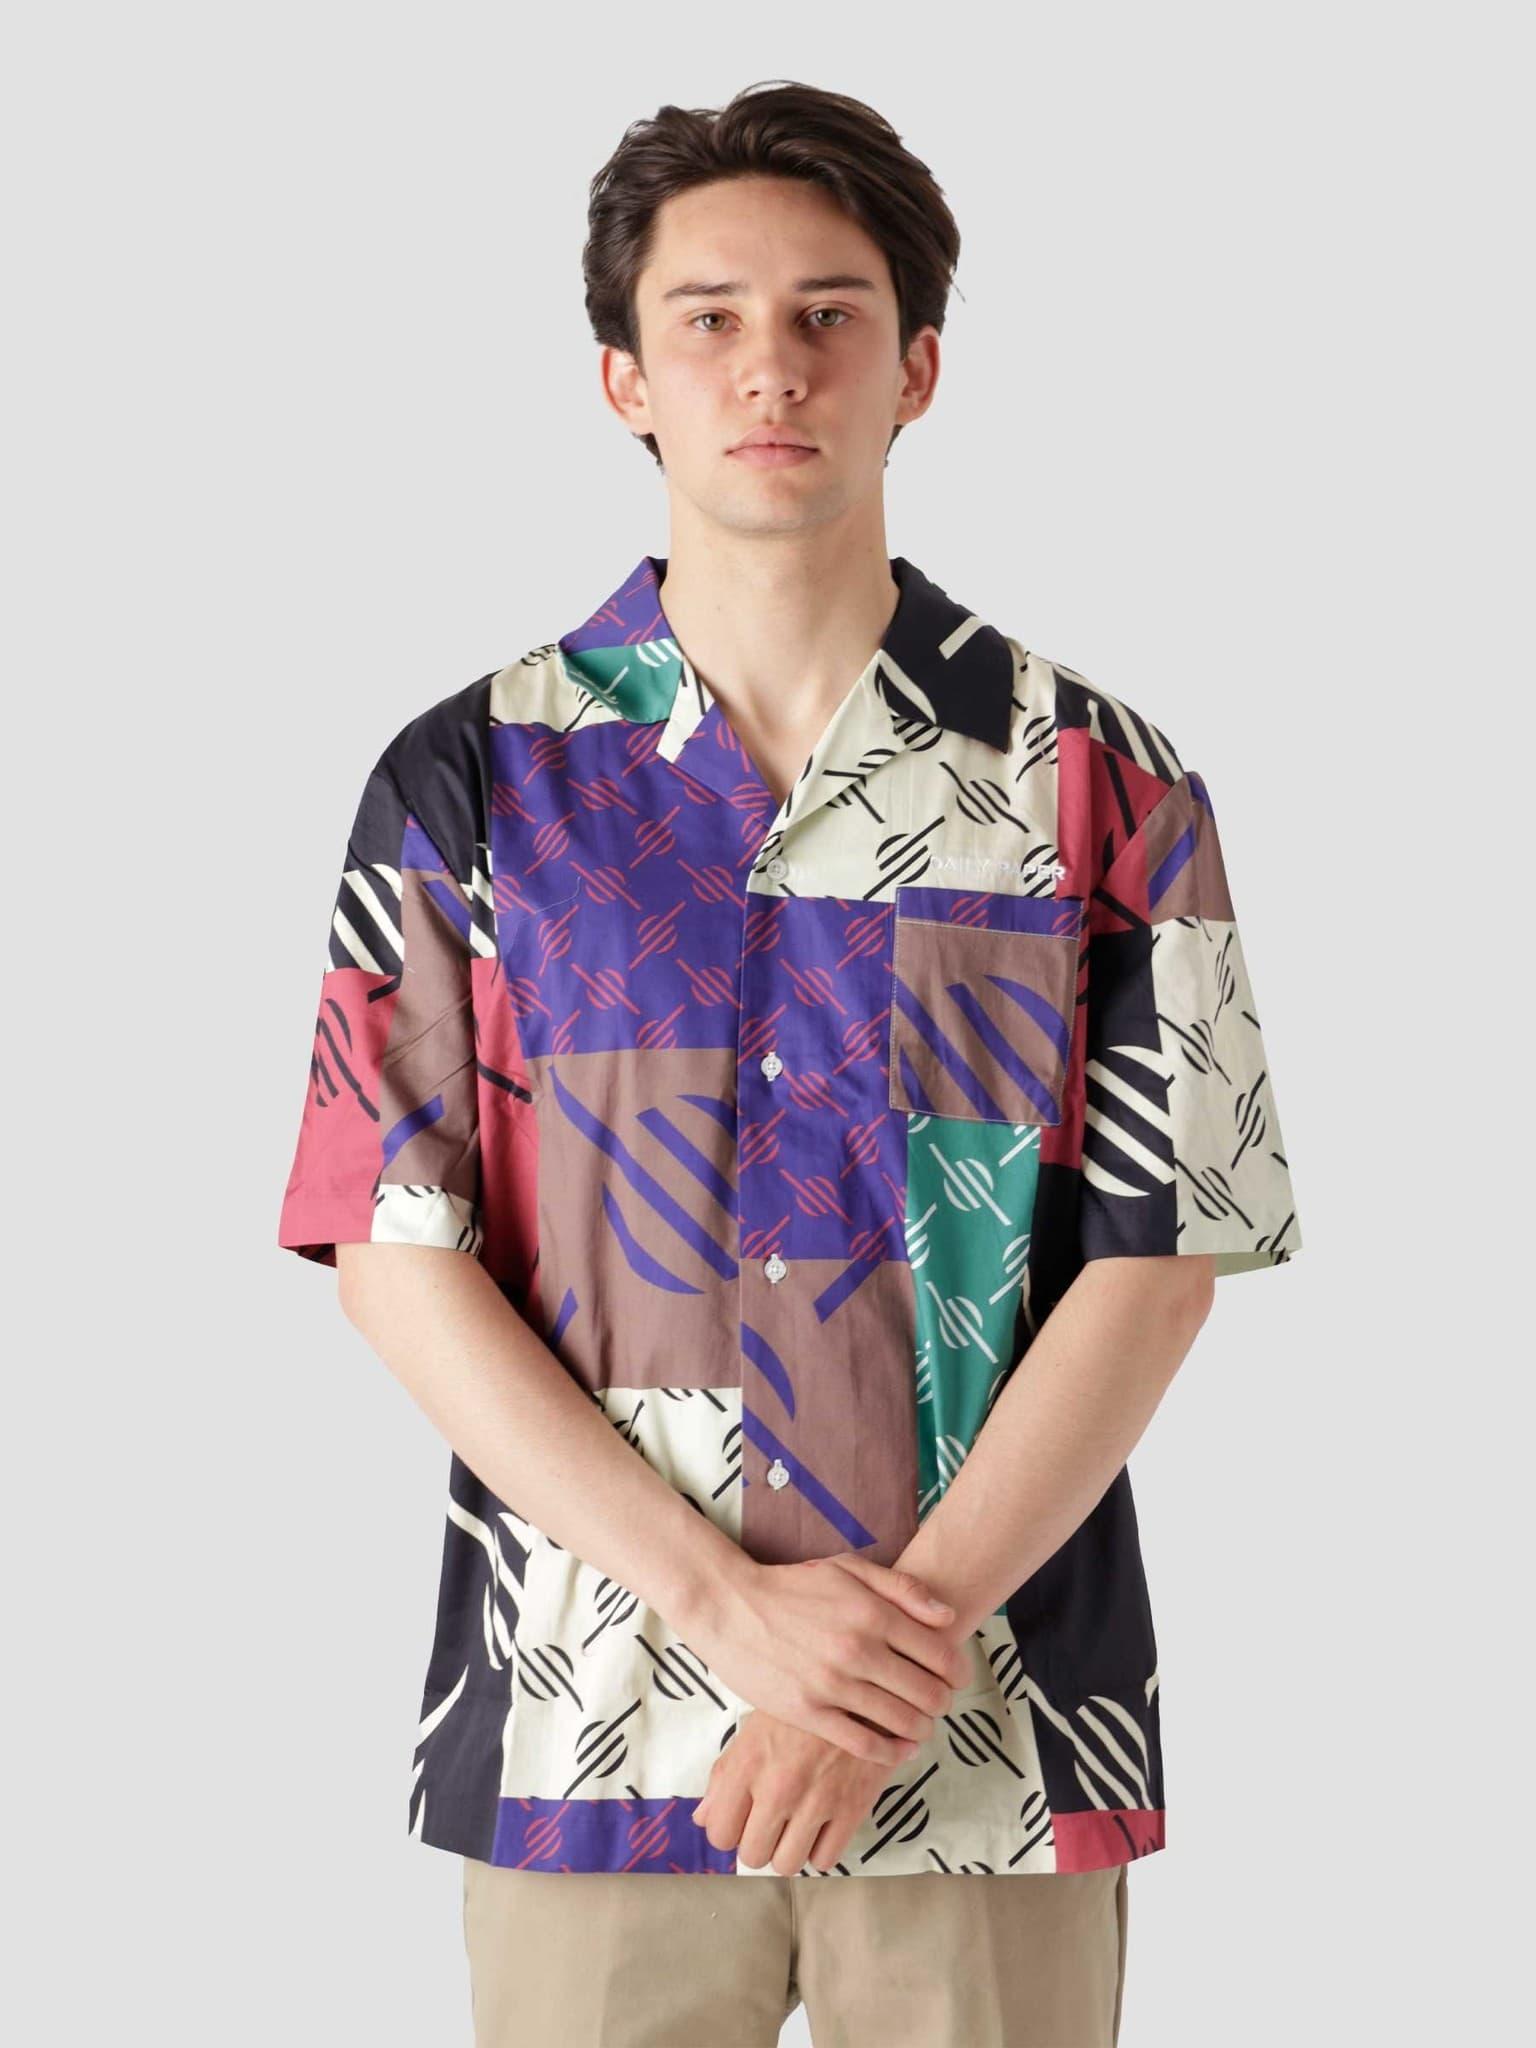 Repatch Shirt Multi Colored 2113008